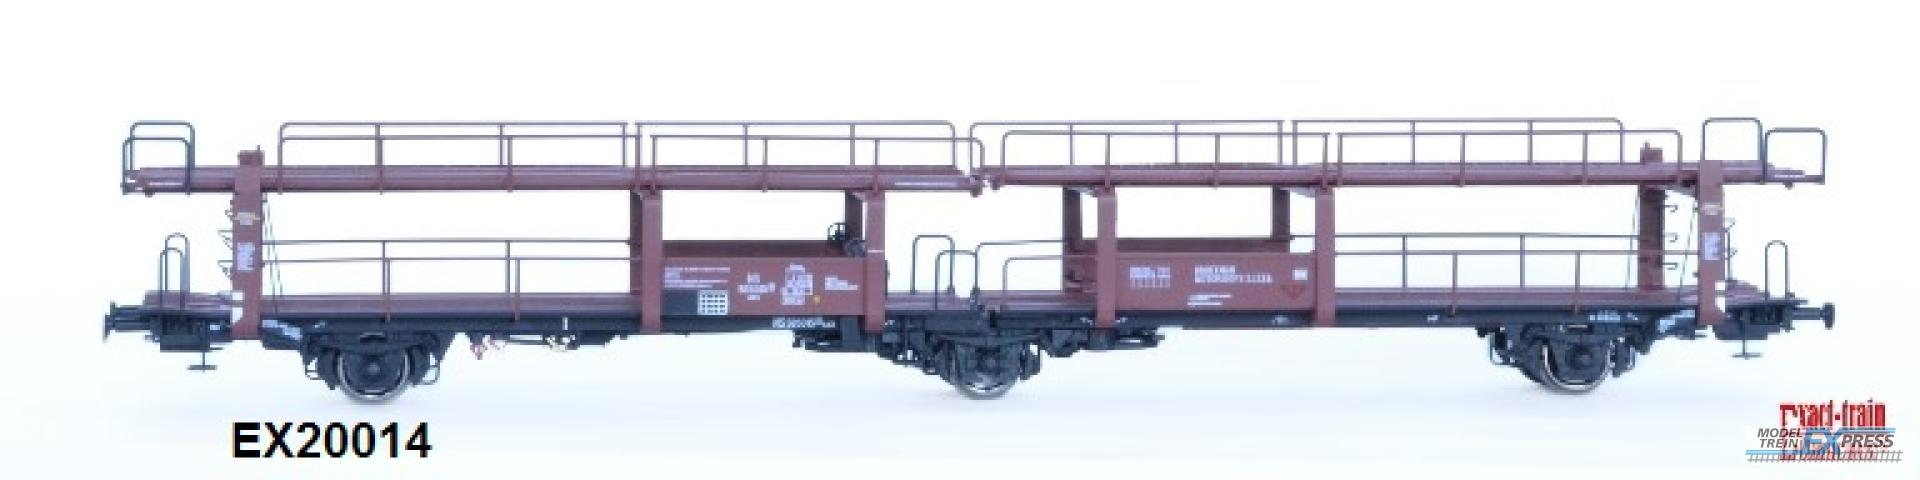 Exact-train 20014